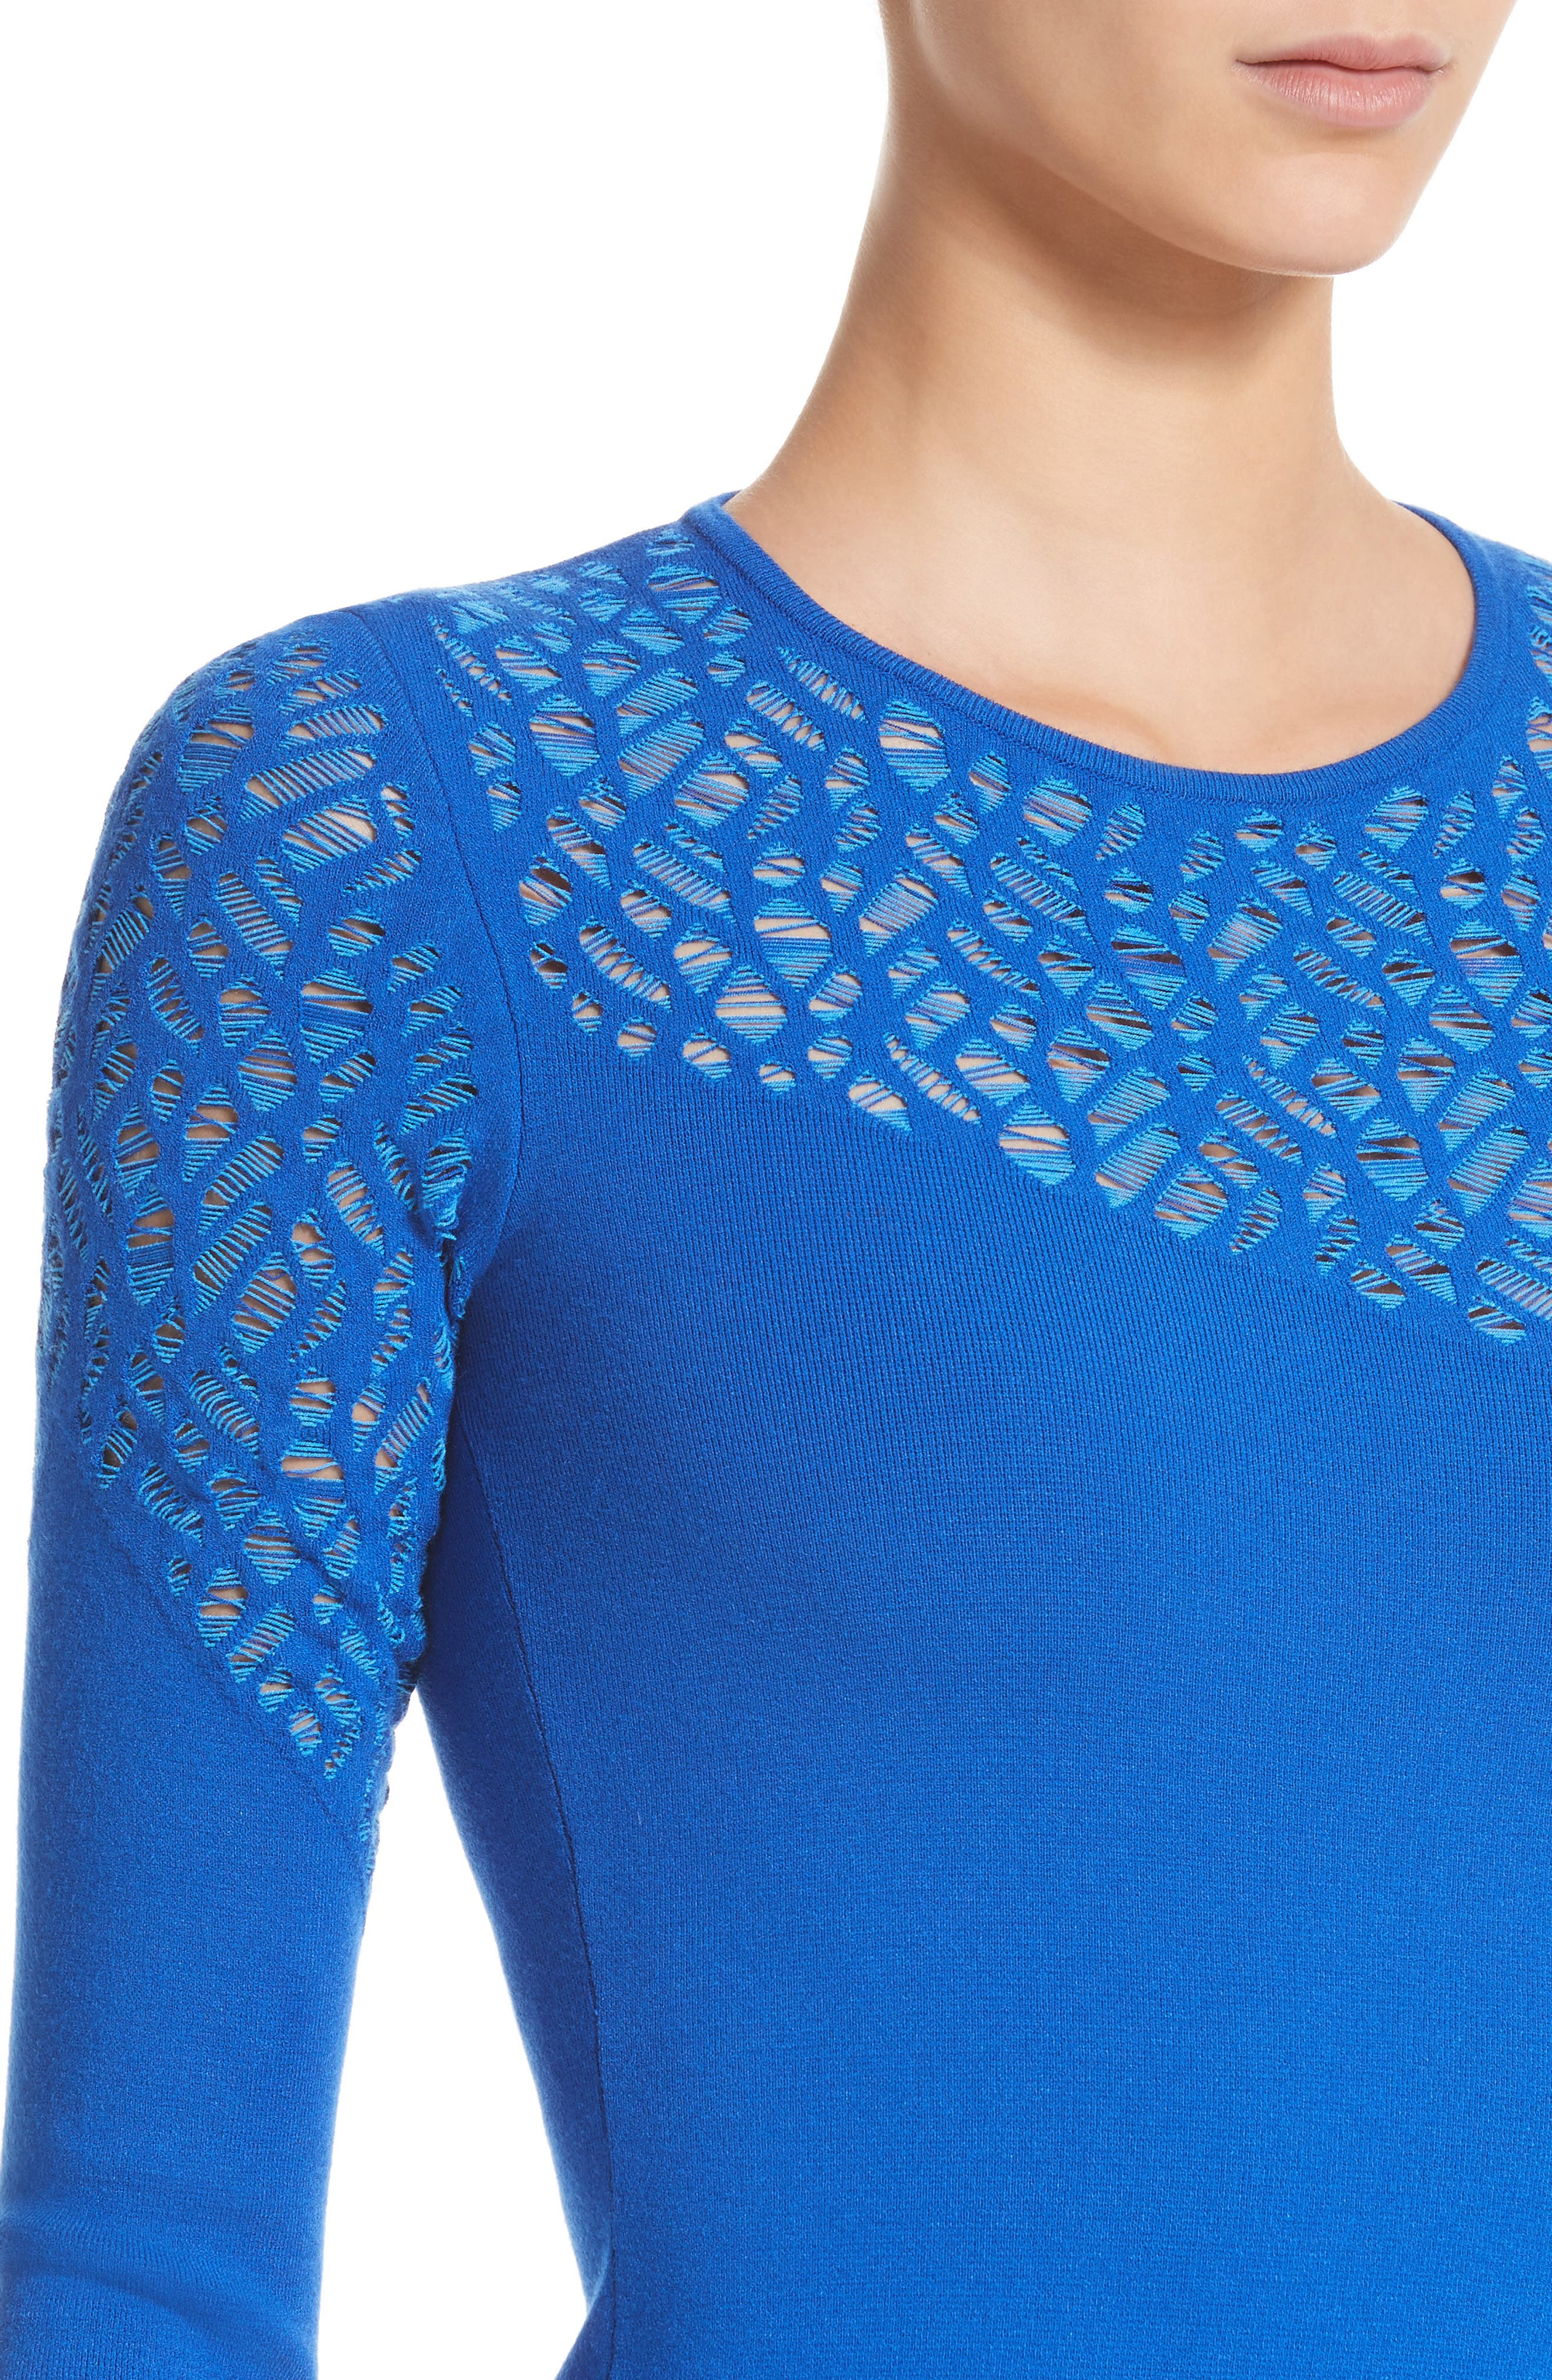 Contrast Stitch Knit Dress,                             Alternate thumbnail 4, color,                             Royal Blue/ Light Blue